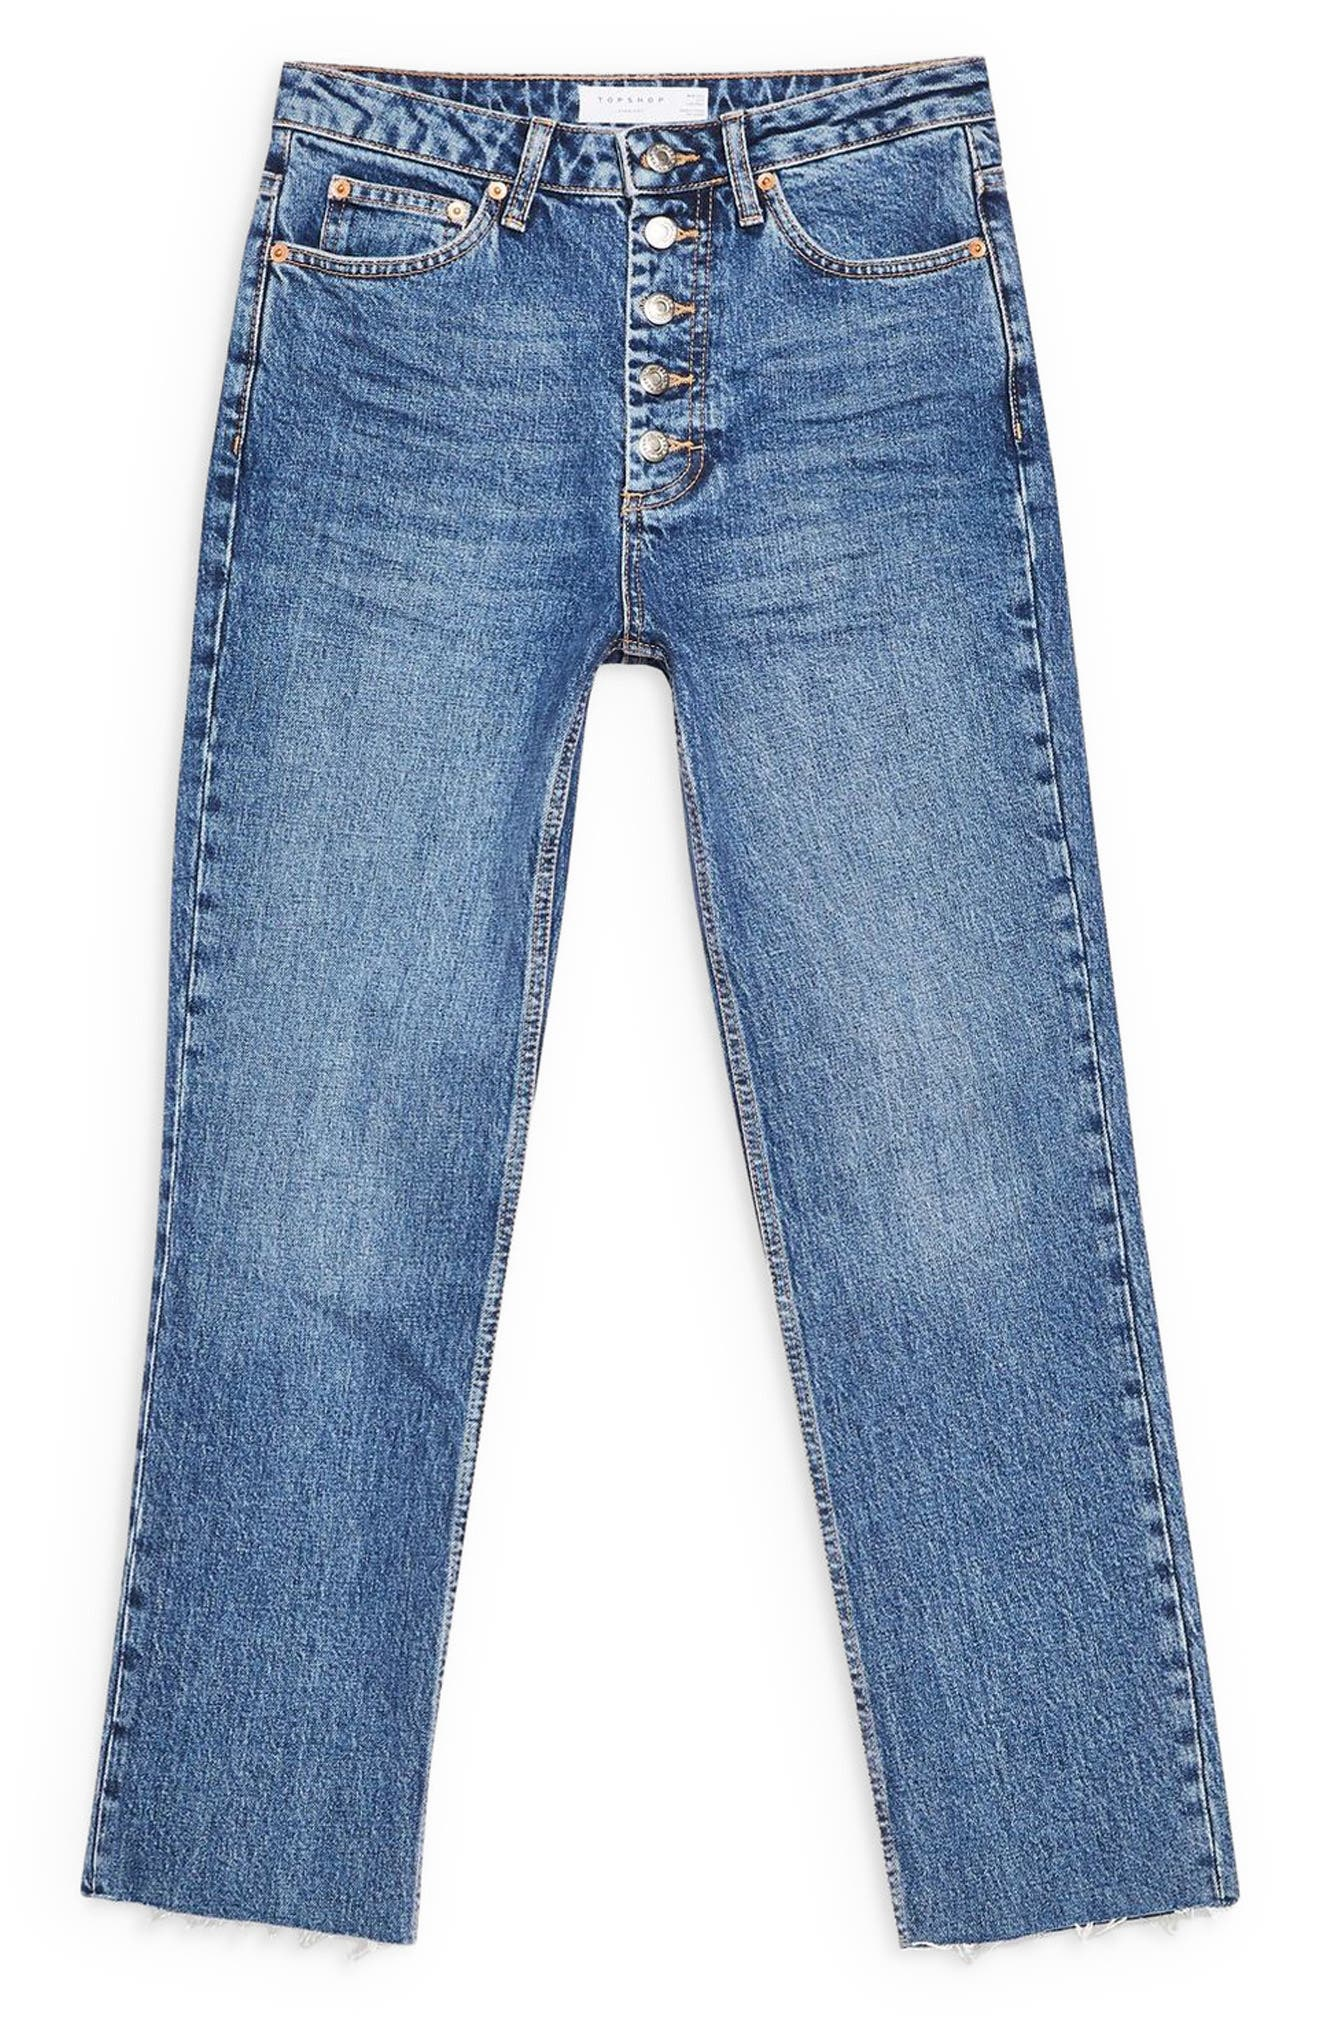 TOPSHOP, Exposed Button Raw Hem Straight Leg Jeans, Alternate thumbnail 3, color, INDIGO